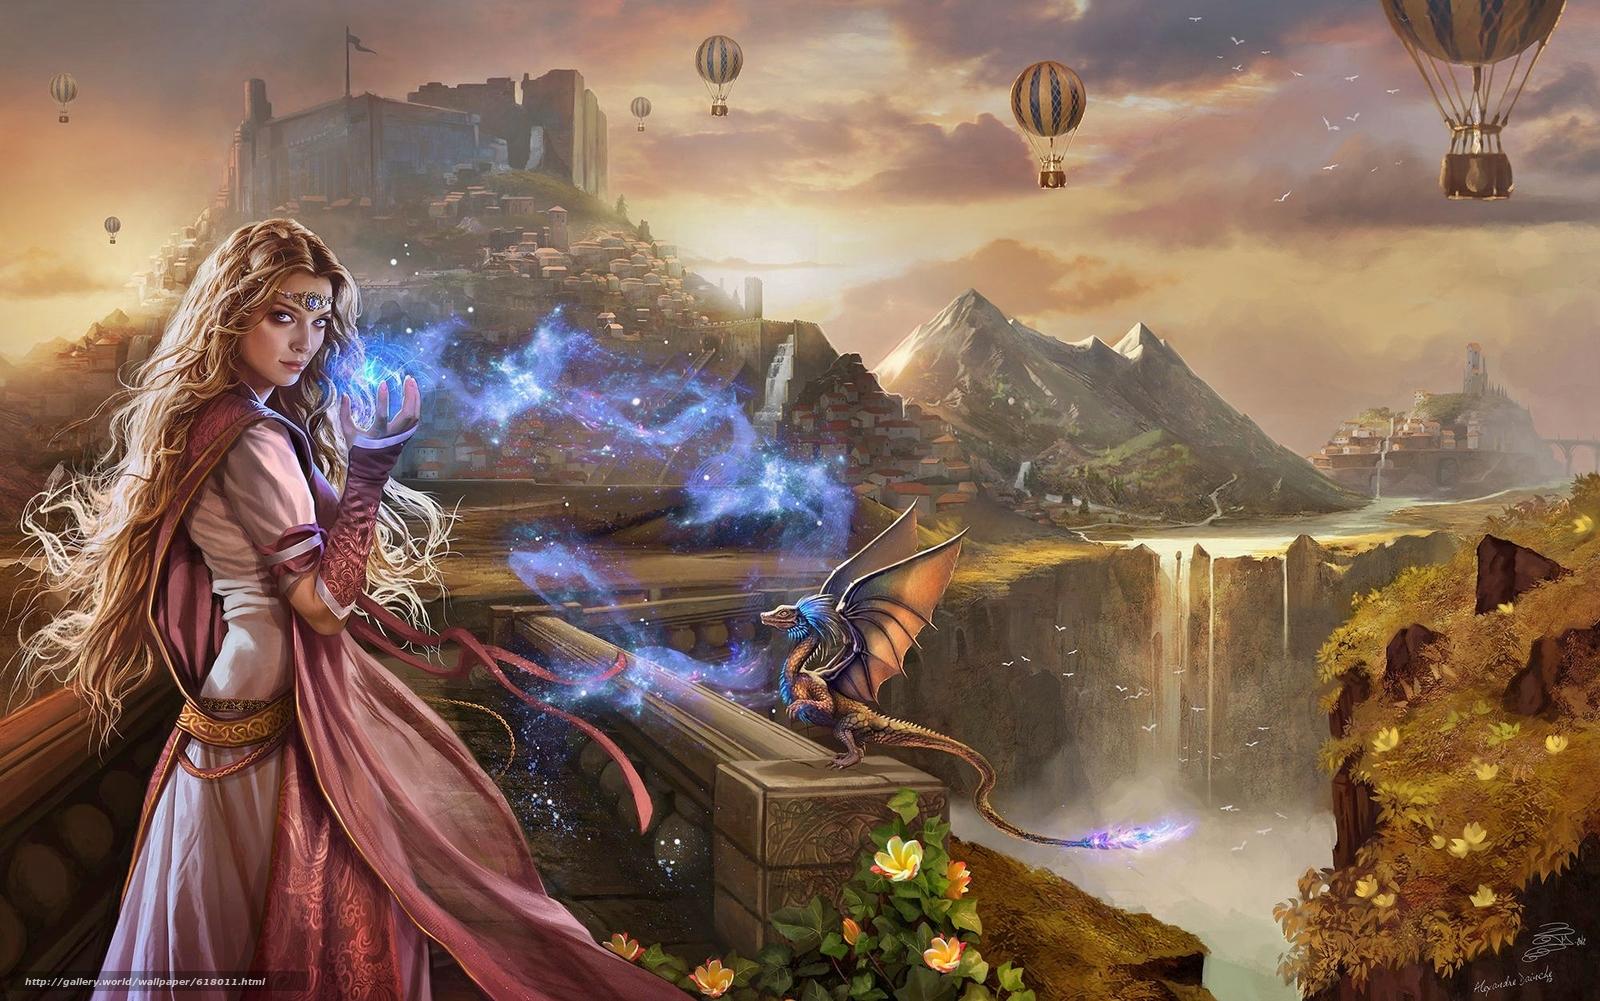 Monde Imaginaire, princess, castle, dragon, magic, balloons, water